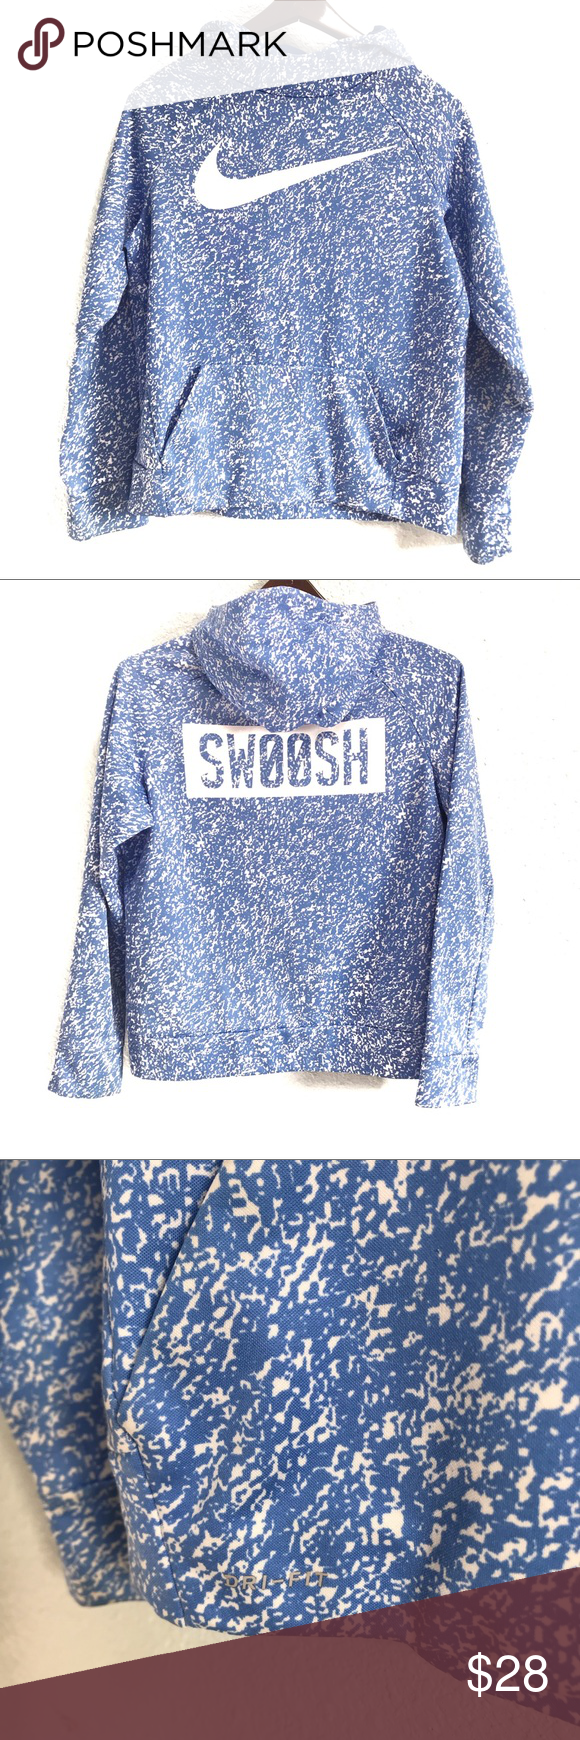 Predownload: Nike Dri Fit Swoosh Blue Polka Dot Hoodie Youth Xl Polka Dot Hoodie Clothes Design Youth Hoodies [ 1740 x 580 Pixel ]